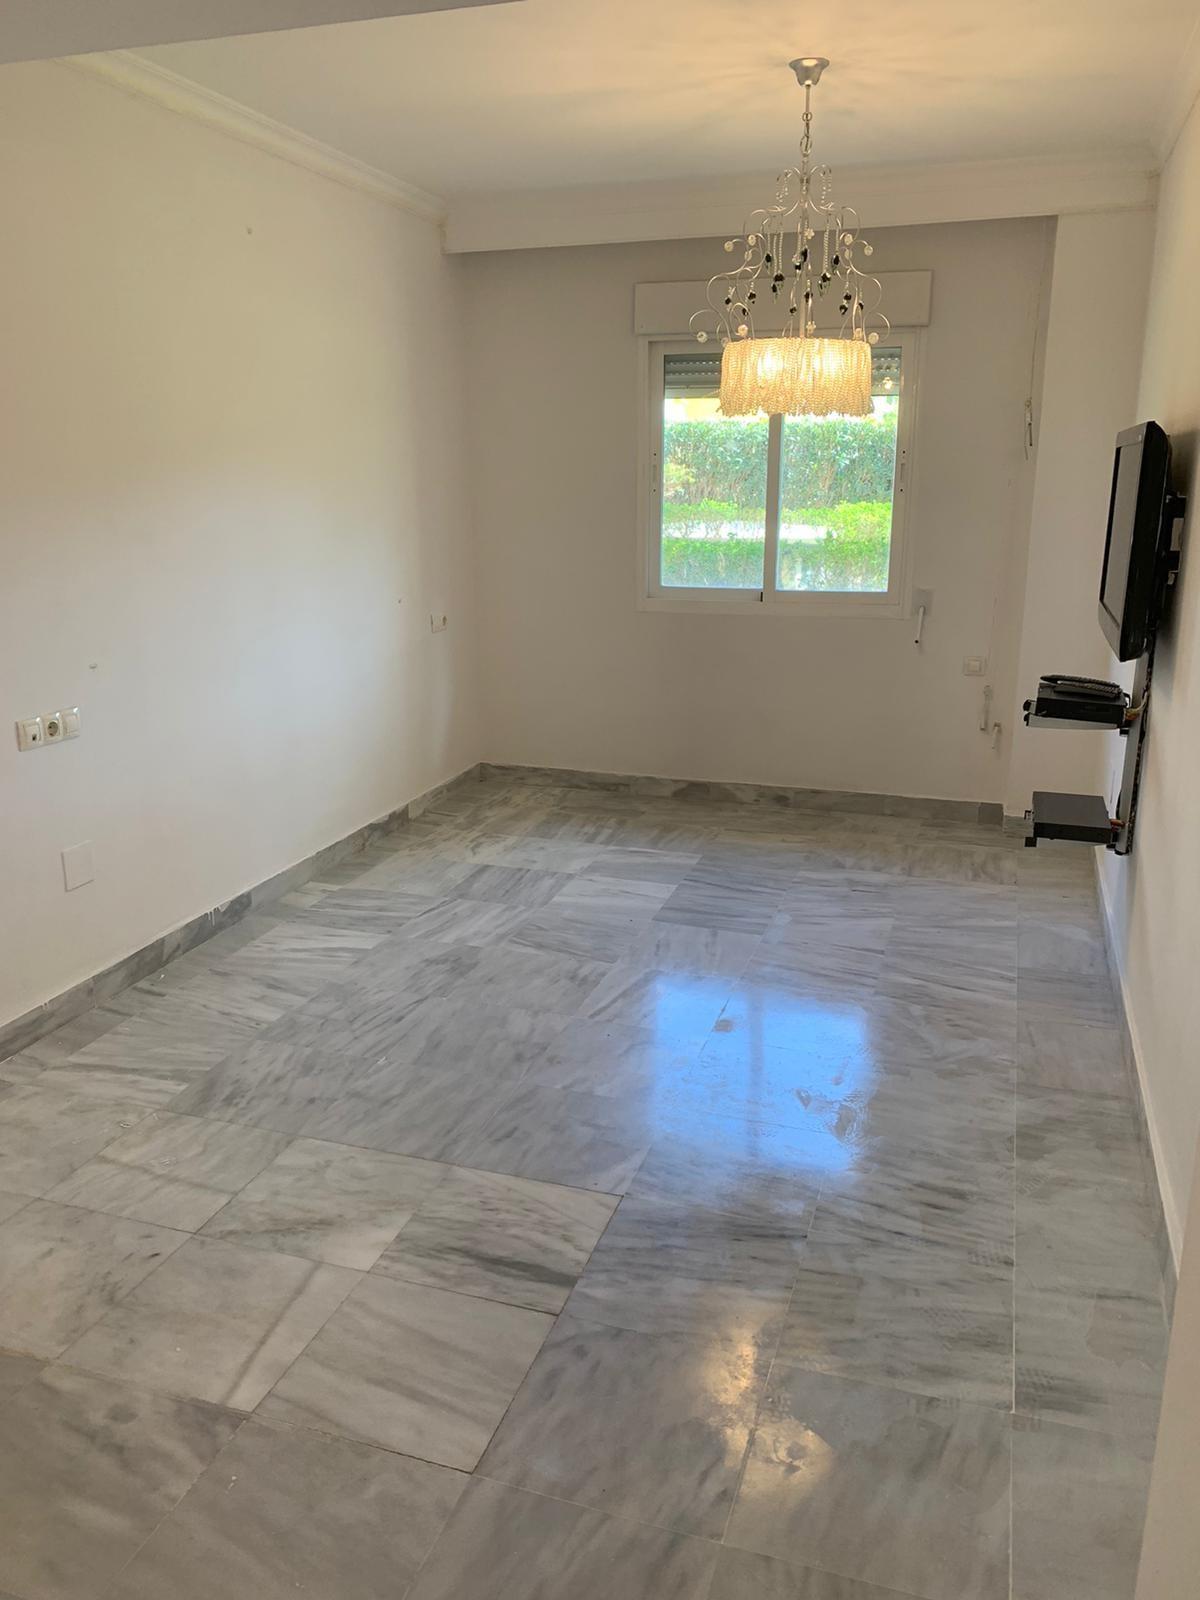 4 Bedroom Ground Floor Apartment For Sale Nueva Andalucía